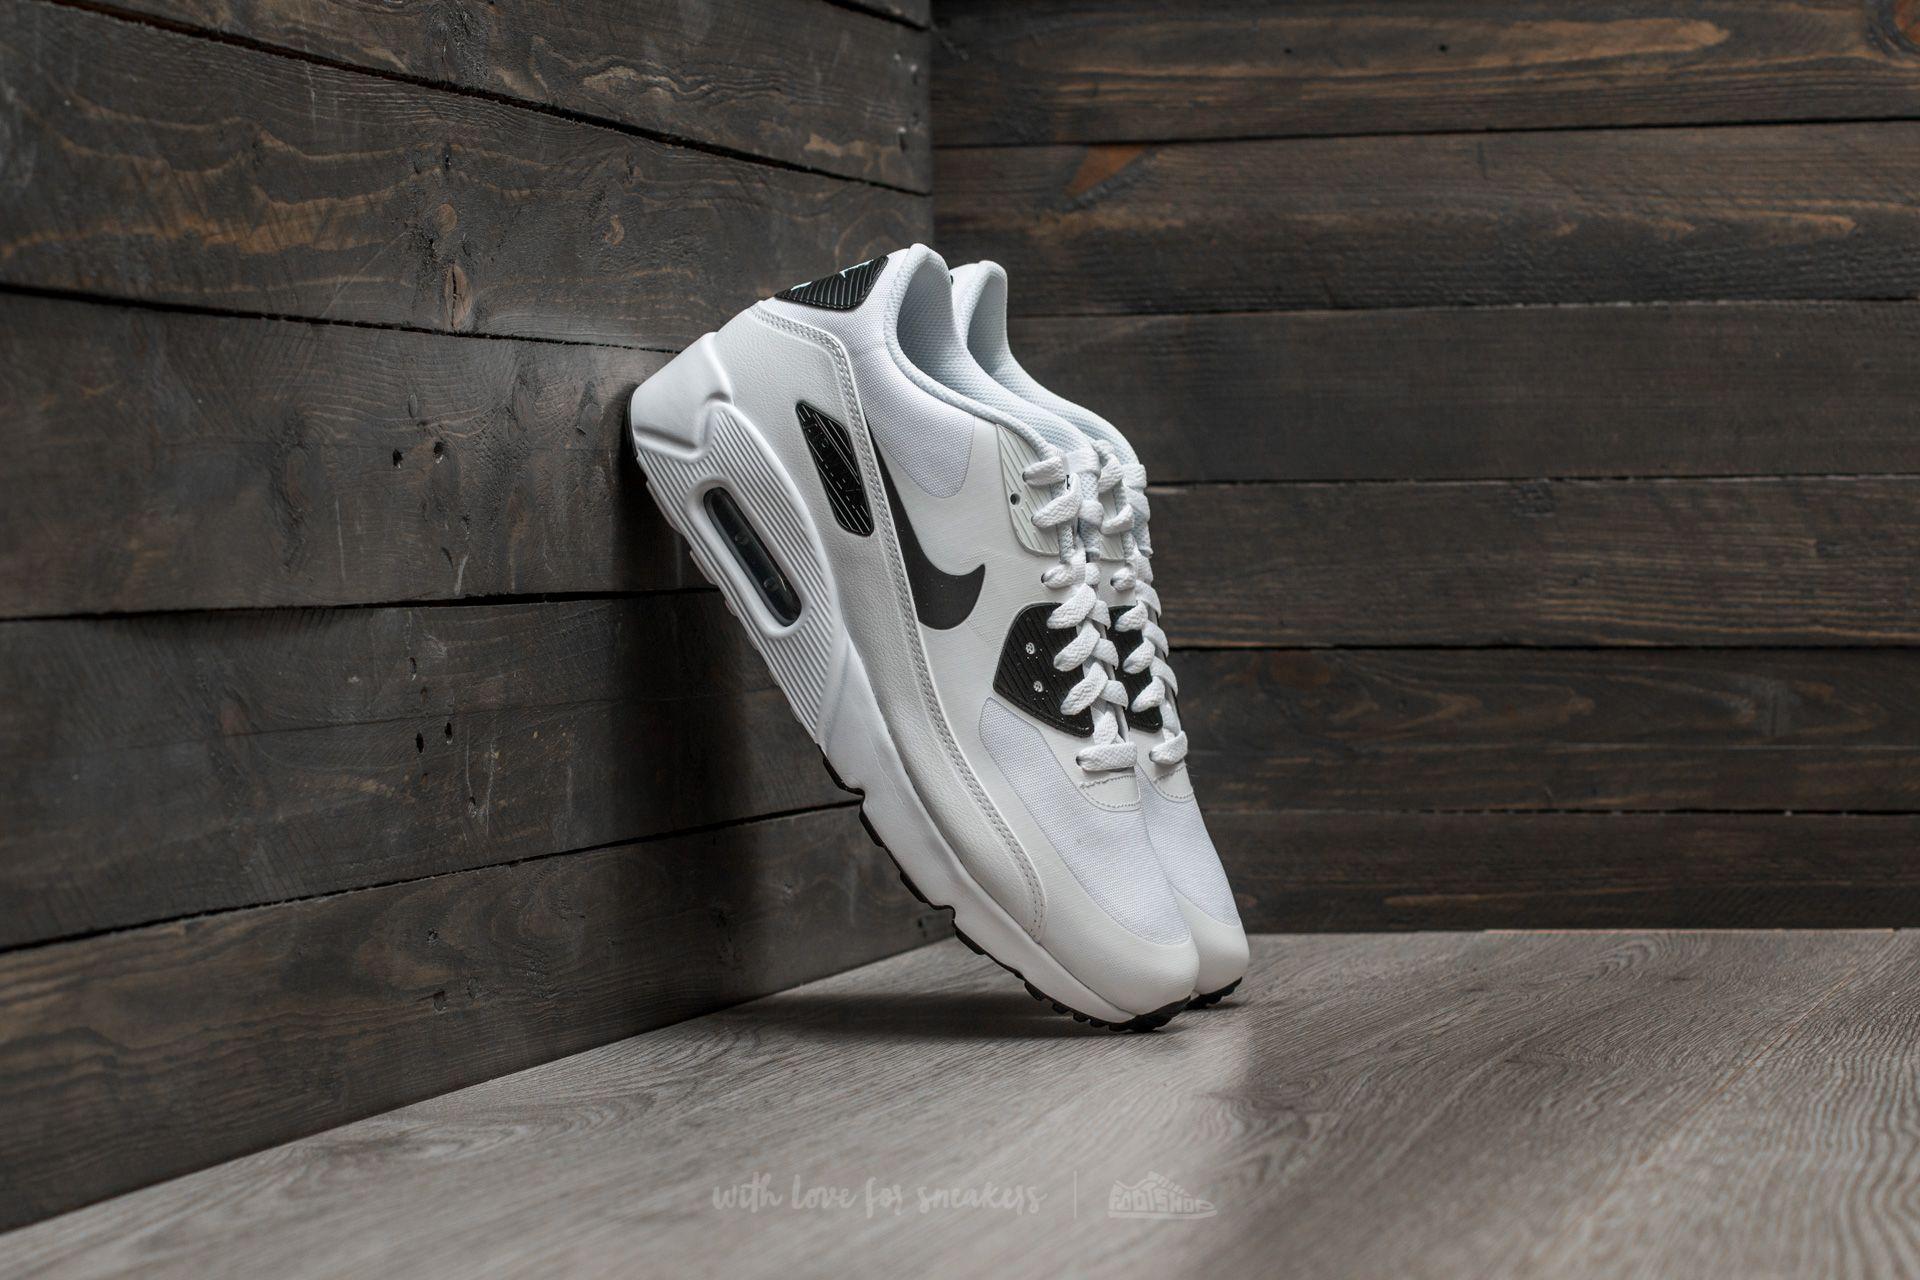 finest selection ac635 c7fb0 Nike Air Max 90 Ultra 2.0 Essential White/ Black-Black ...